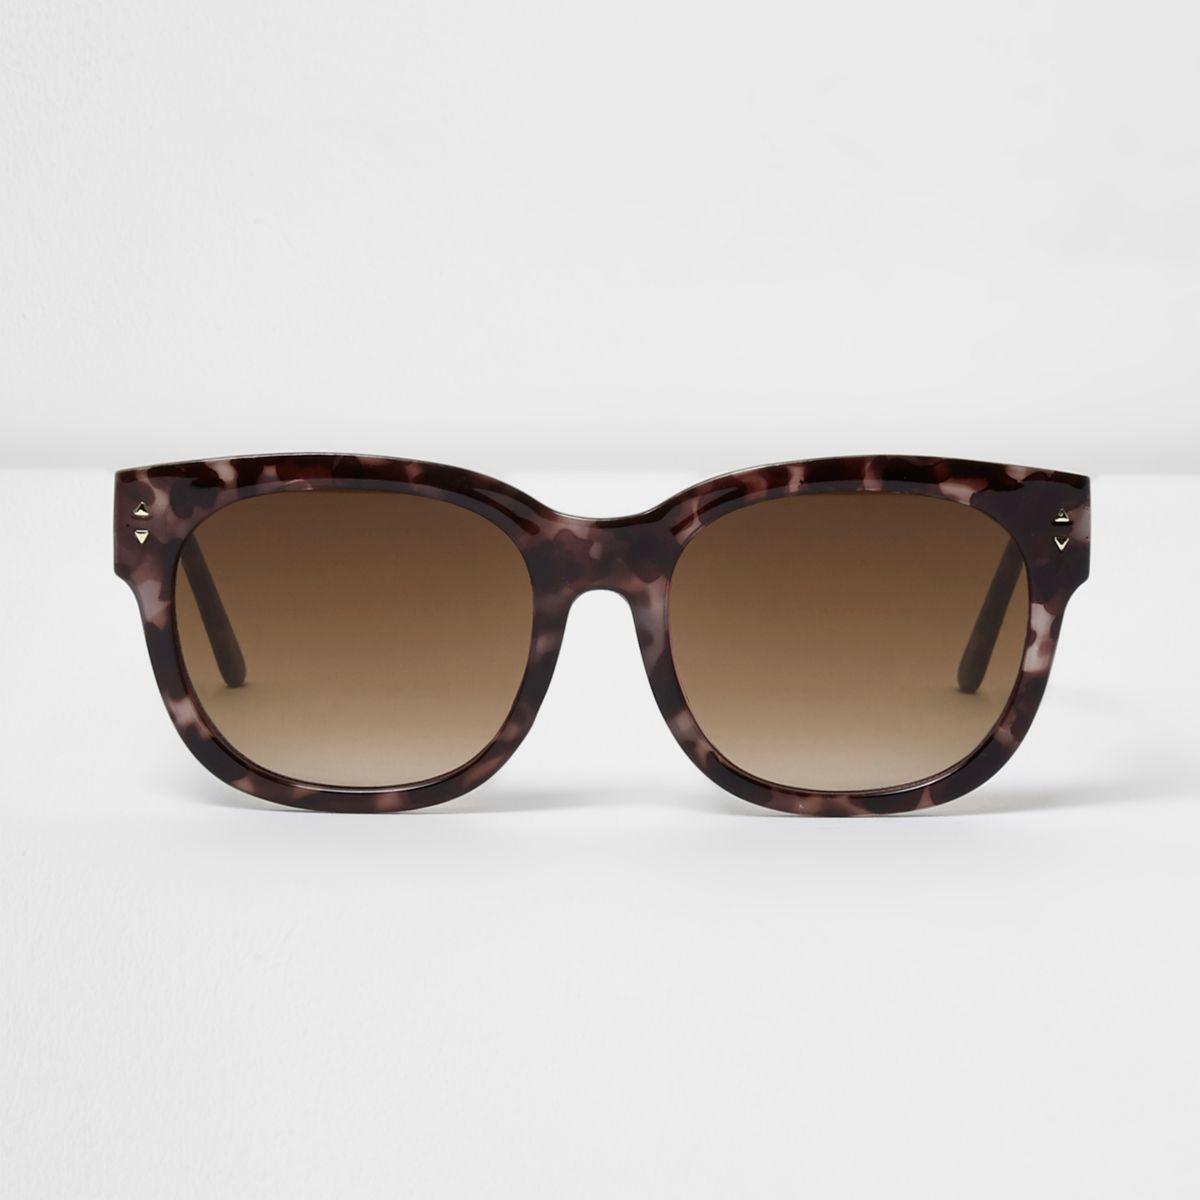 Purple tortoiseshell oversized sunglasses